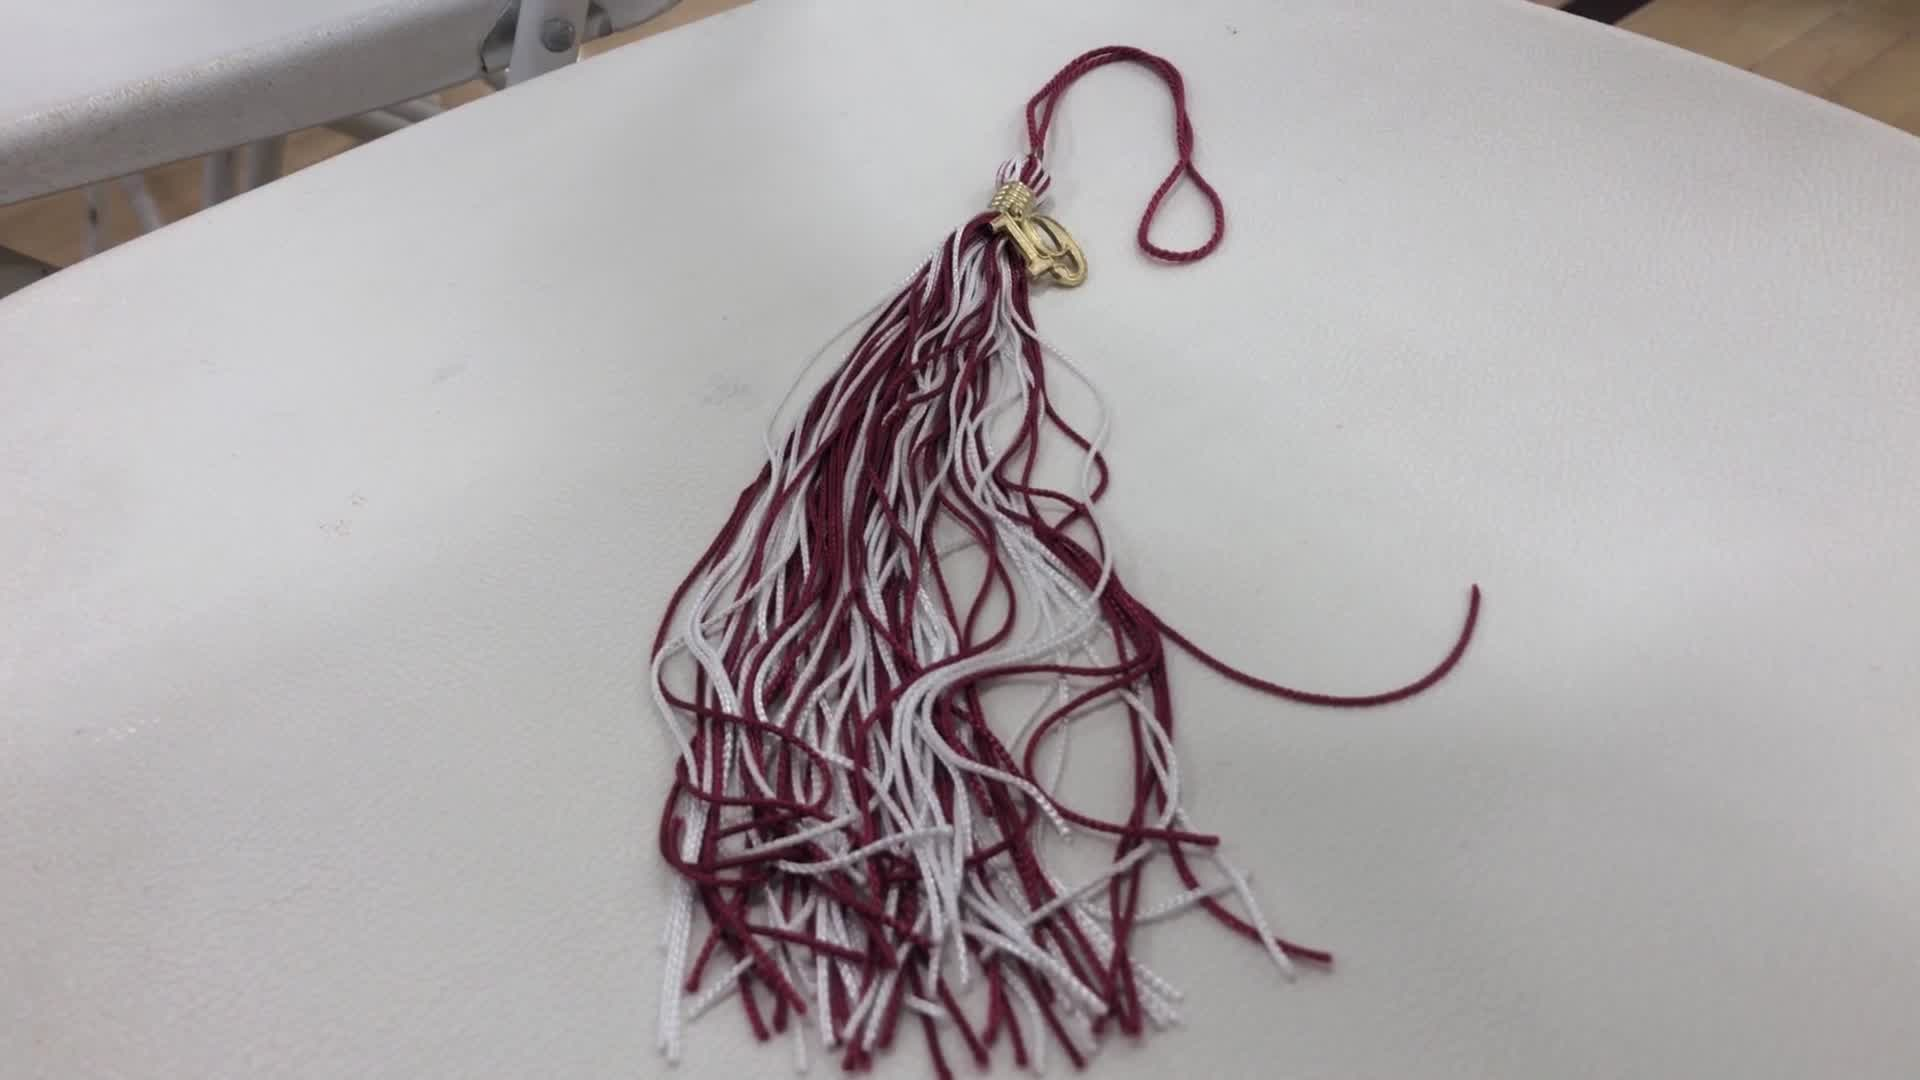 AAHS Graduation Ceremony Controversy